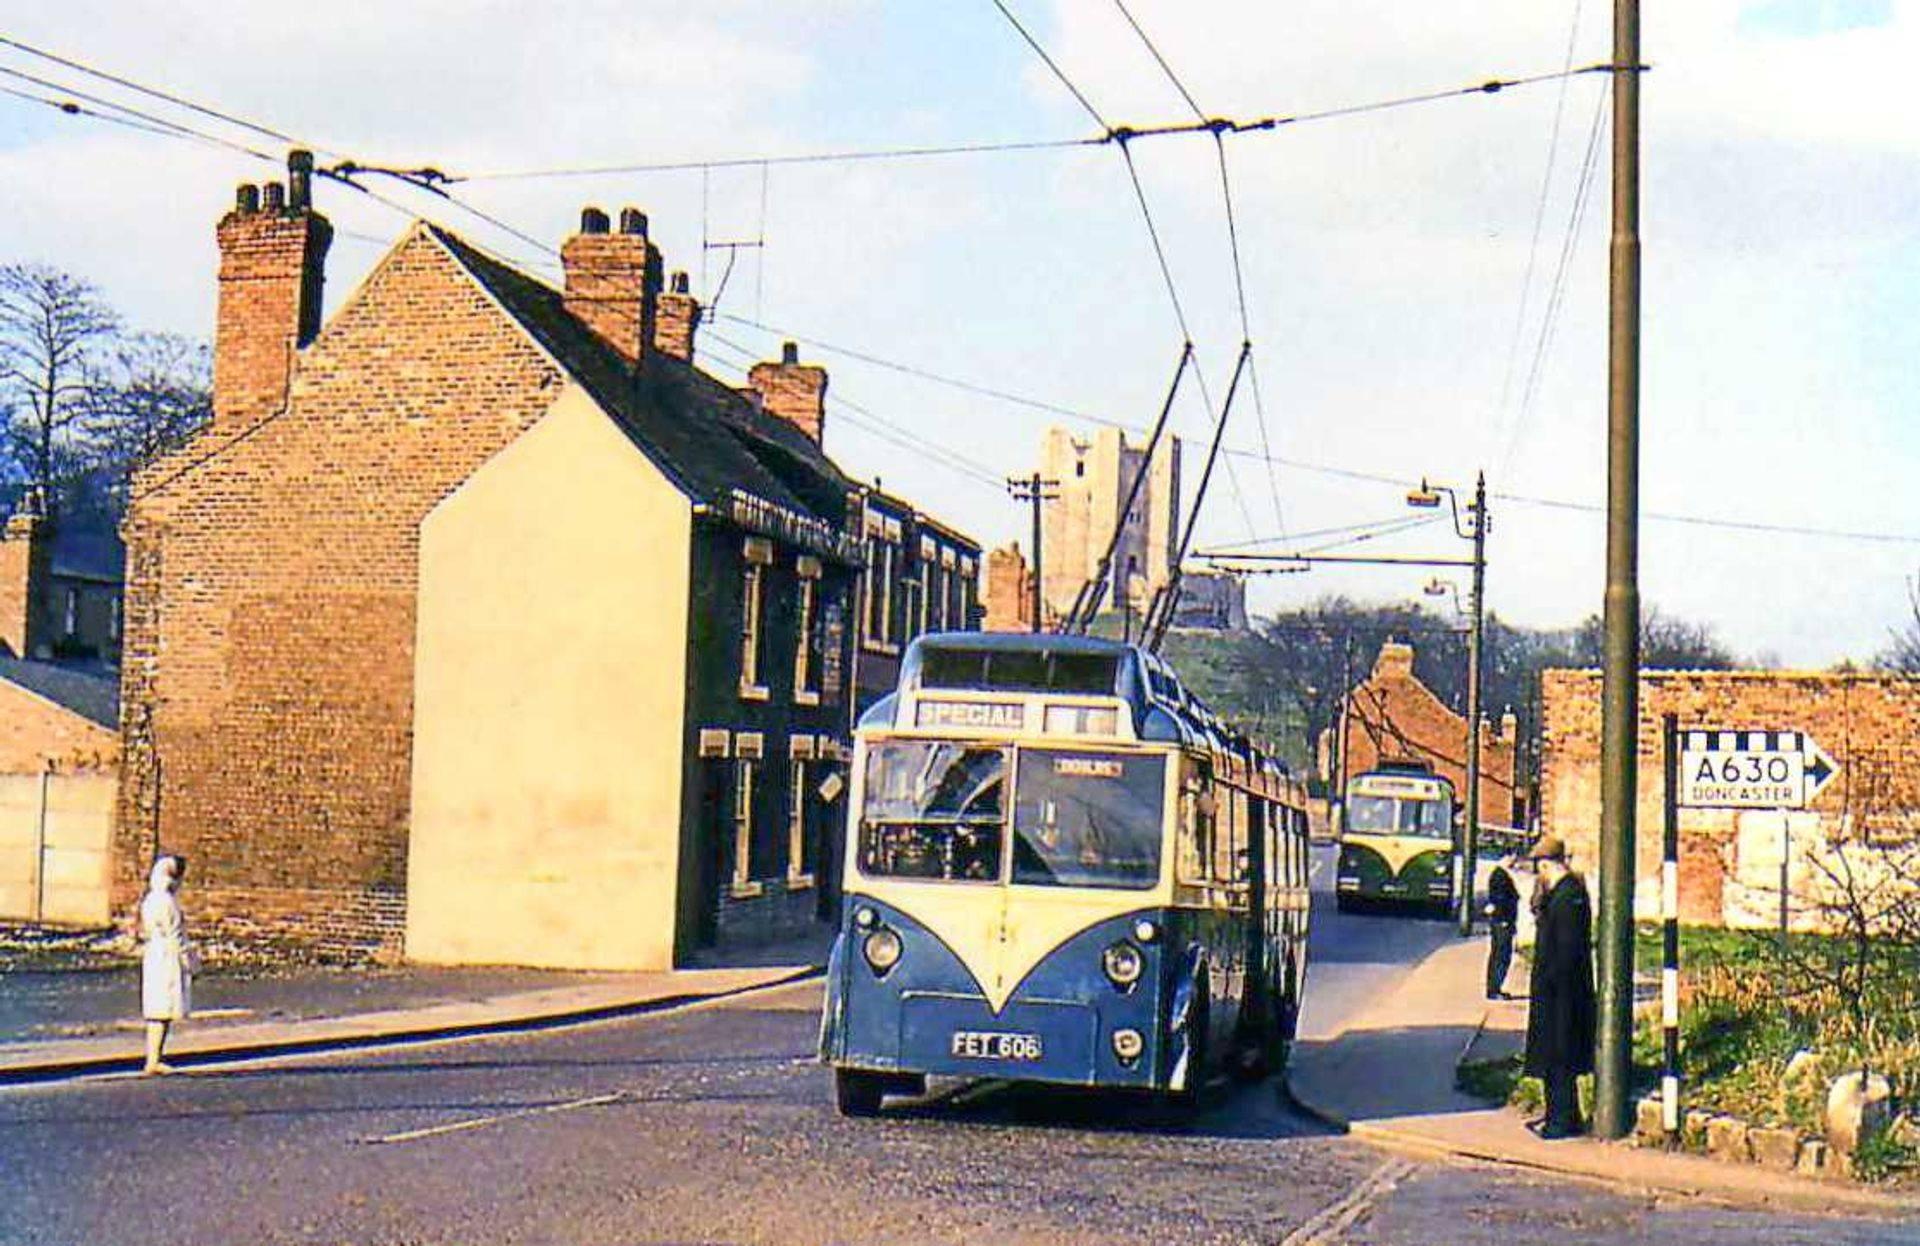 Low Road Conisbrough